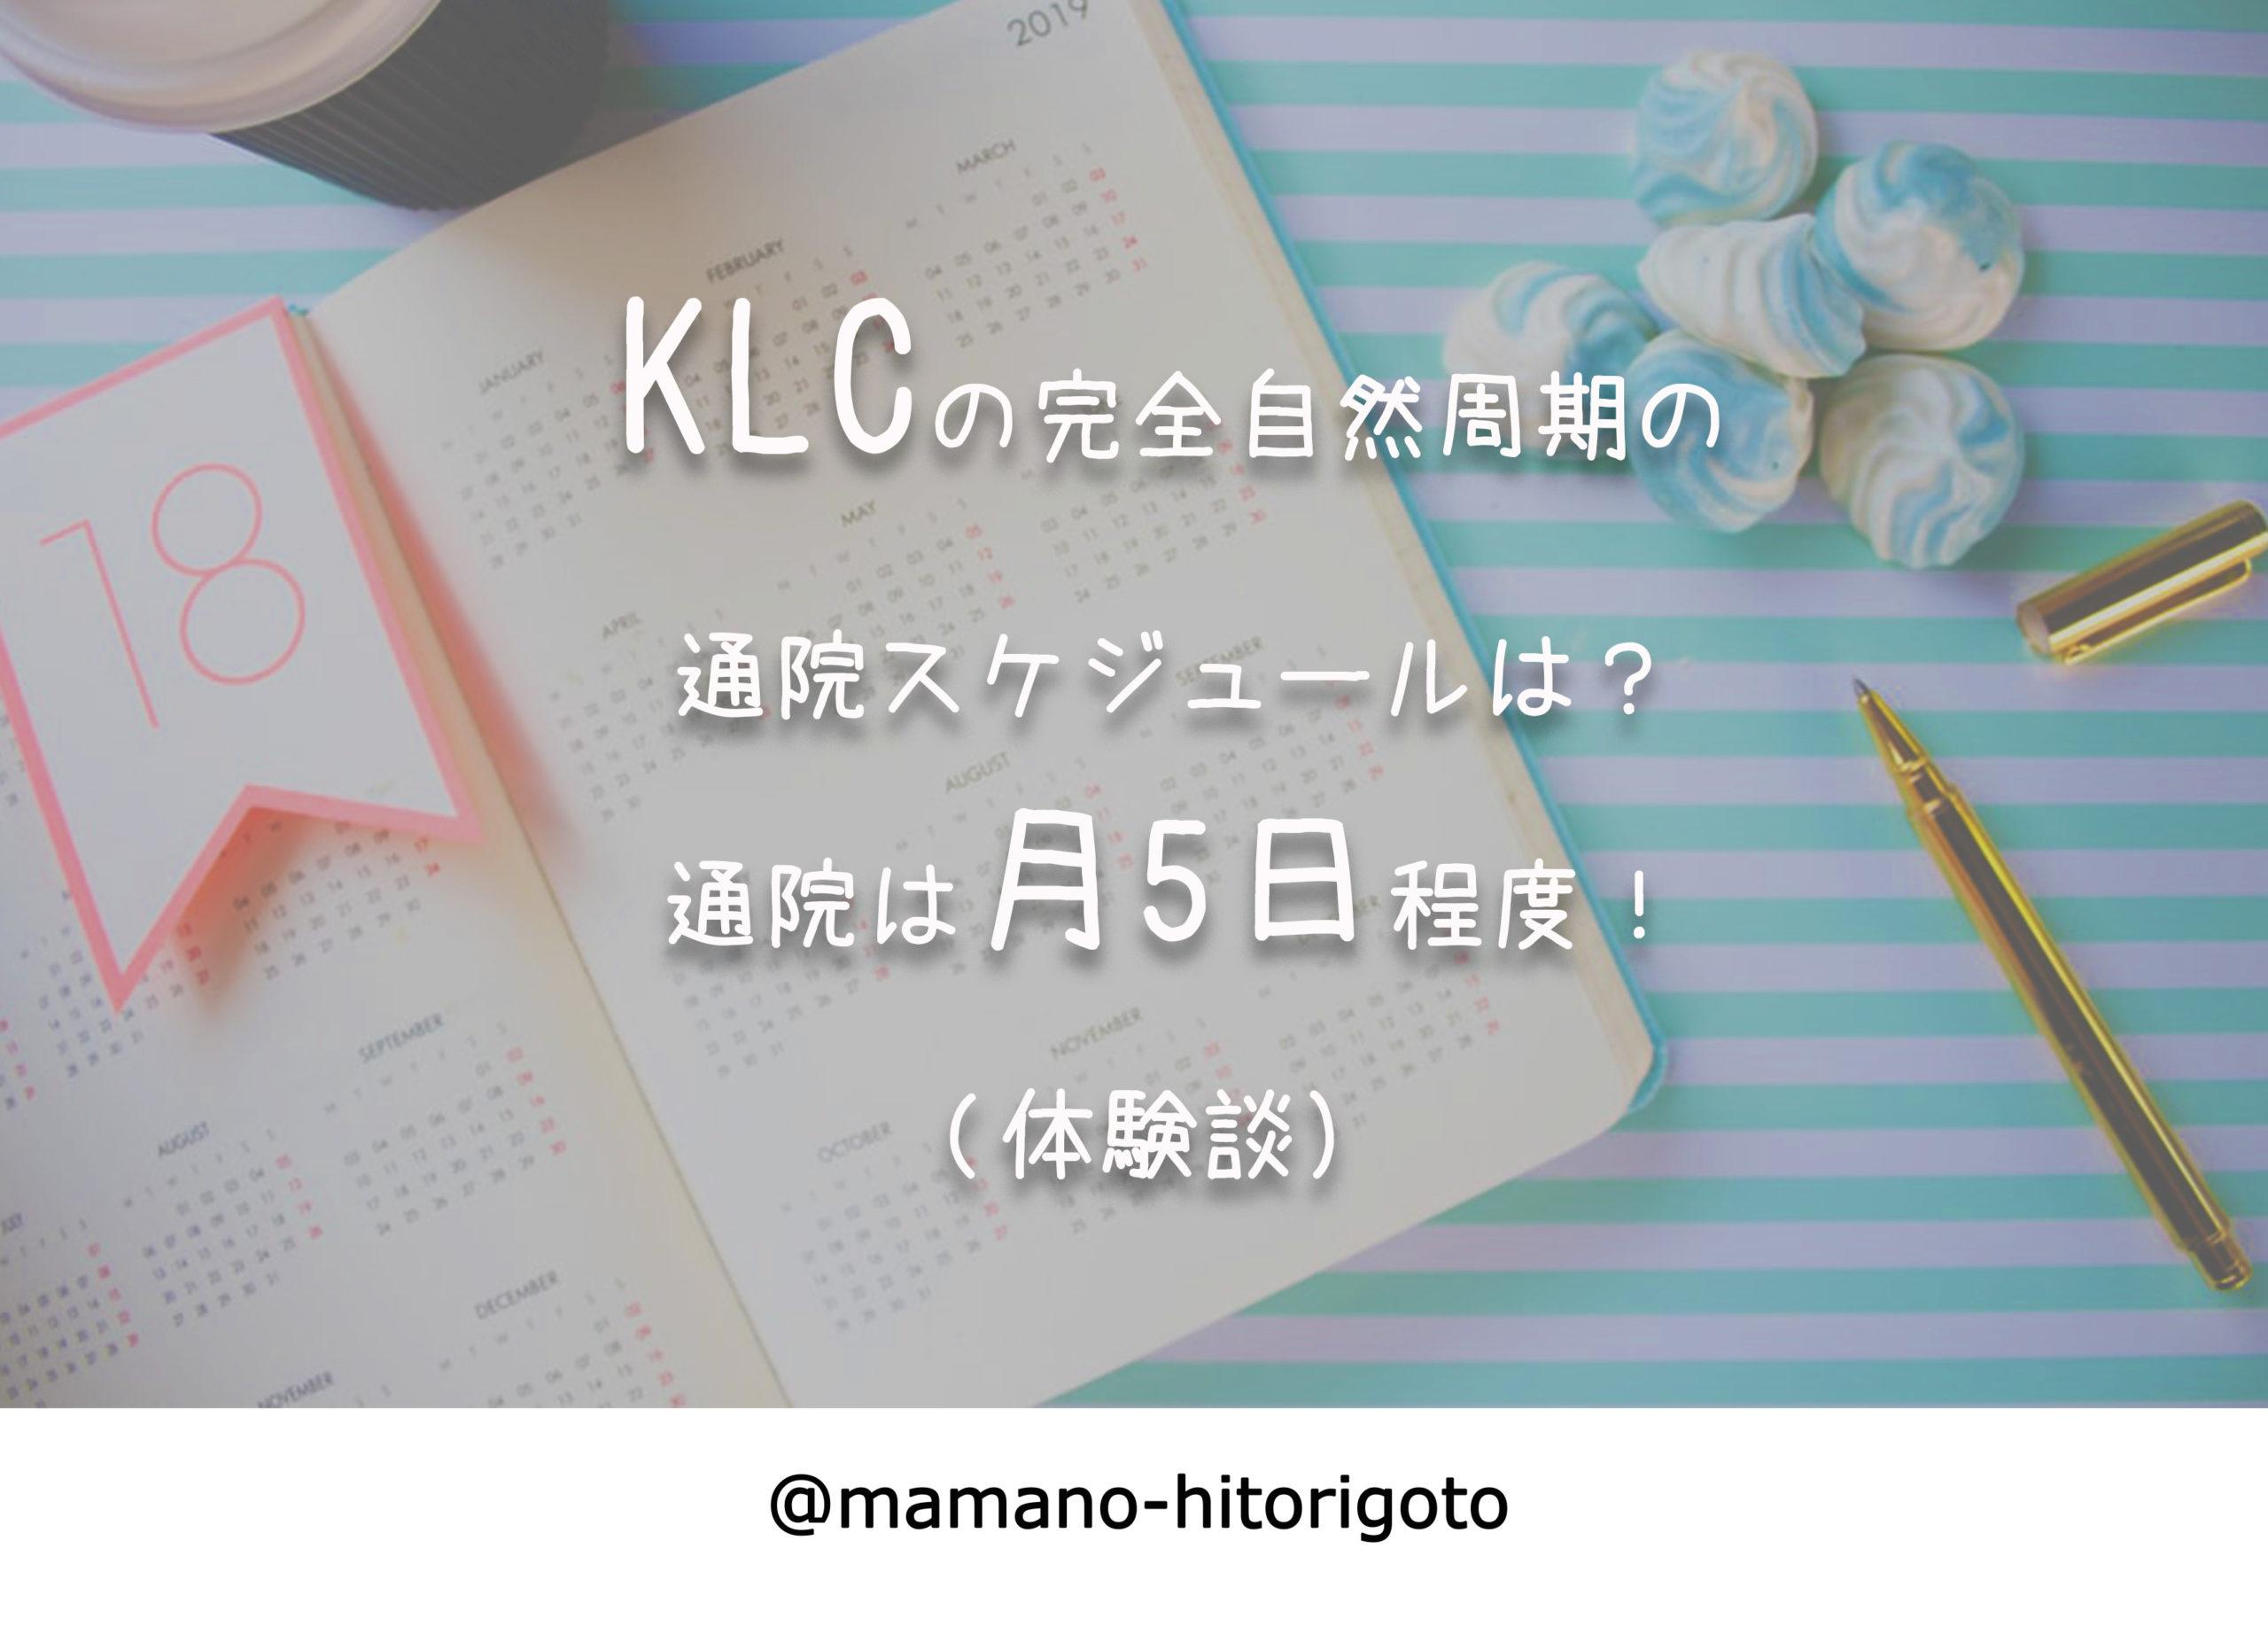 KLCの完全自然周期の通院スケジュールは?通院は月5日程度!